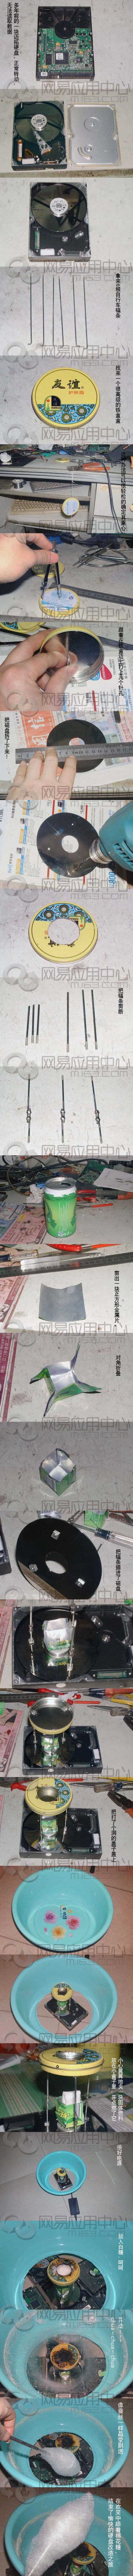 :))))))))))))))))) zucchero filato fatto in casa :))))))))))    http://www.duitang.com/people/mblog/26709976/detail/